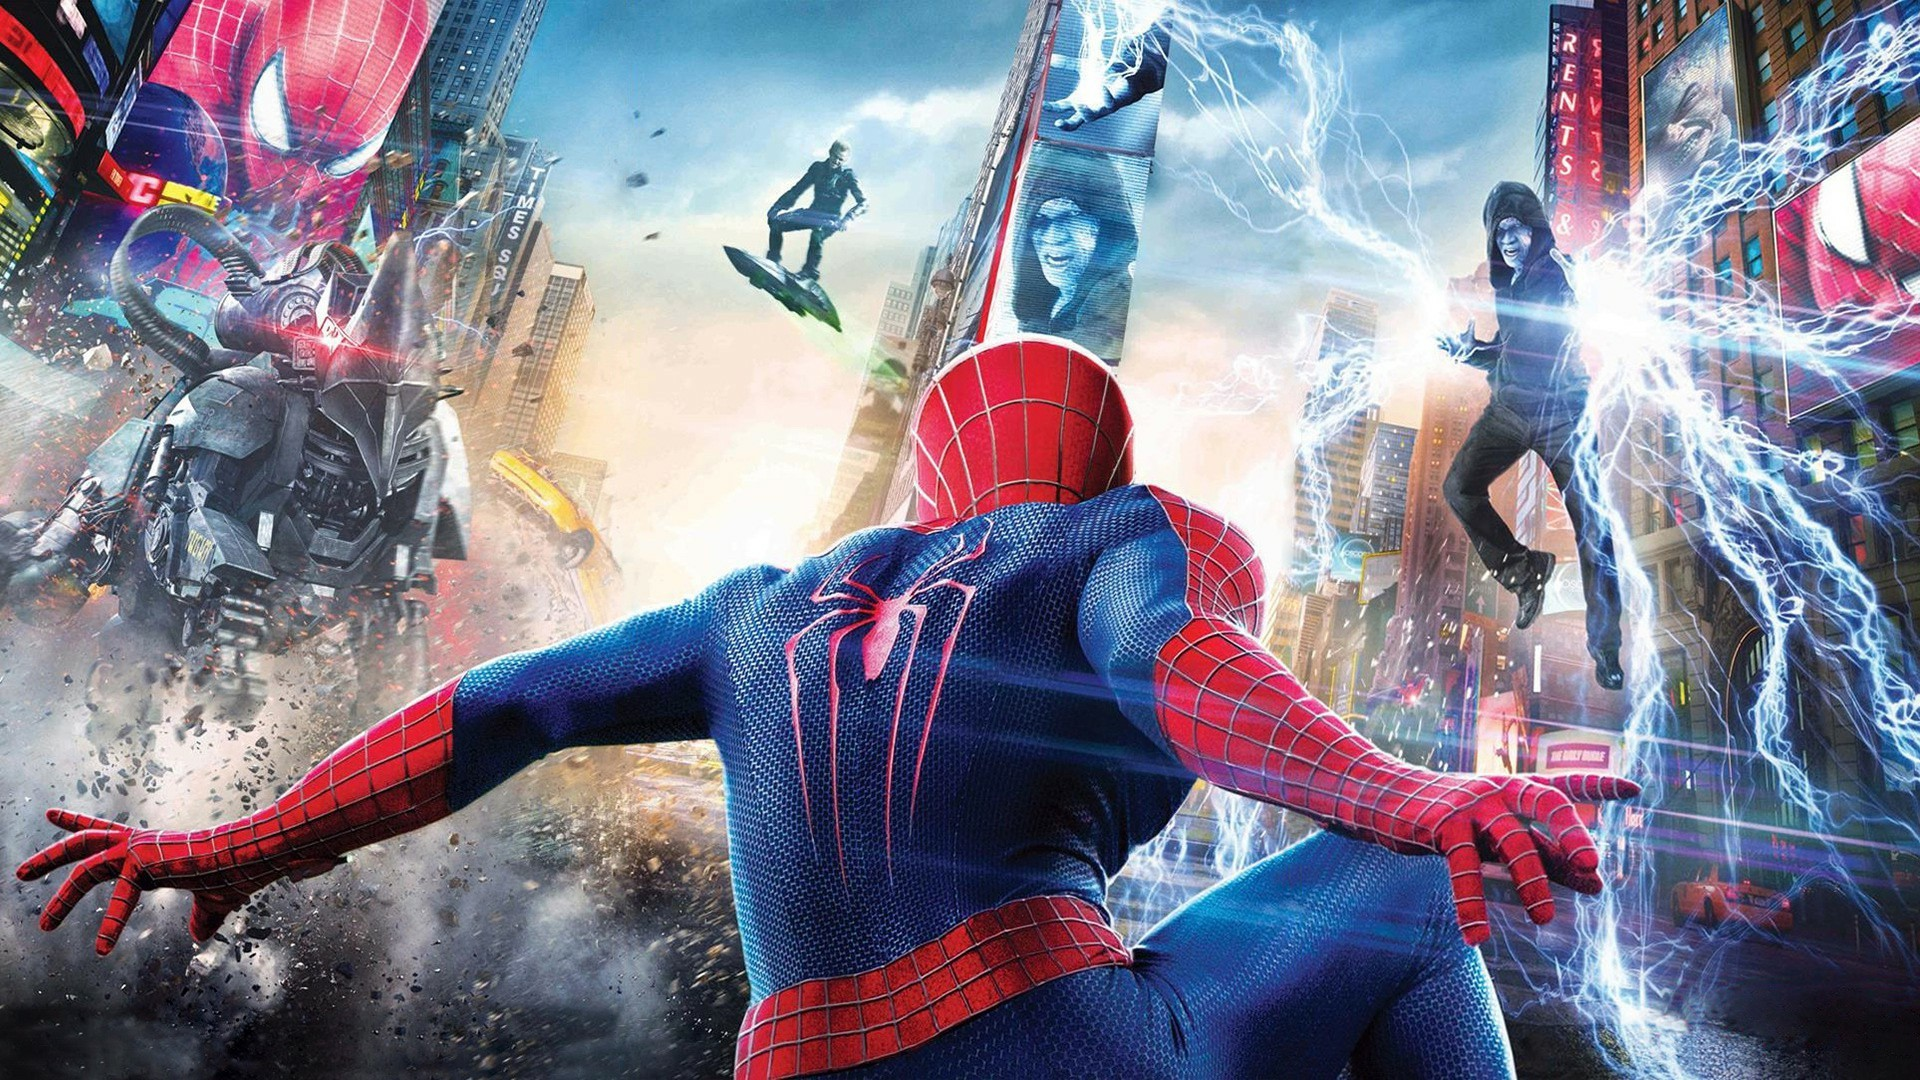 The Amazing Spider Man HD desktop wallpaper High Definition